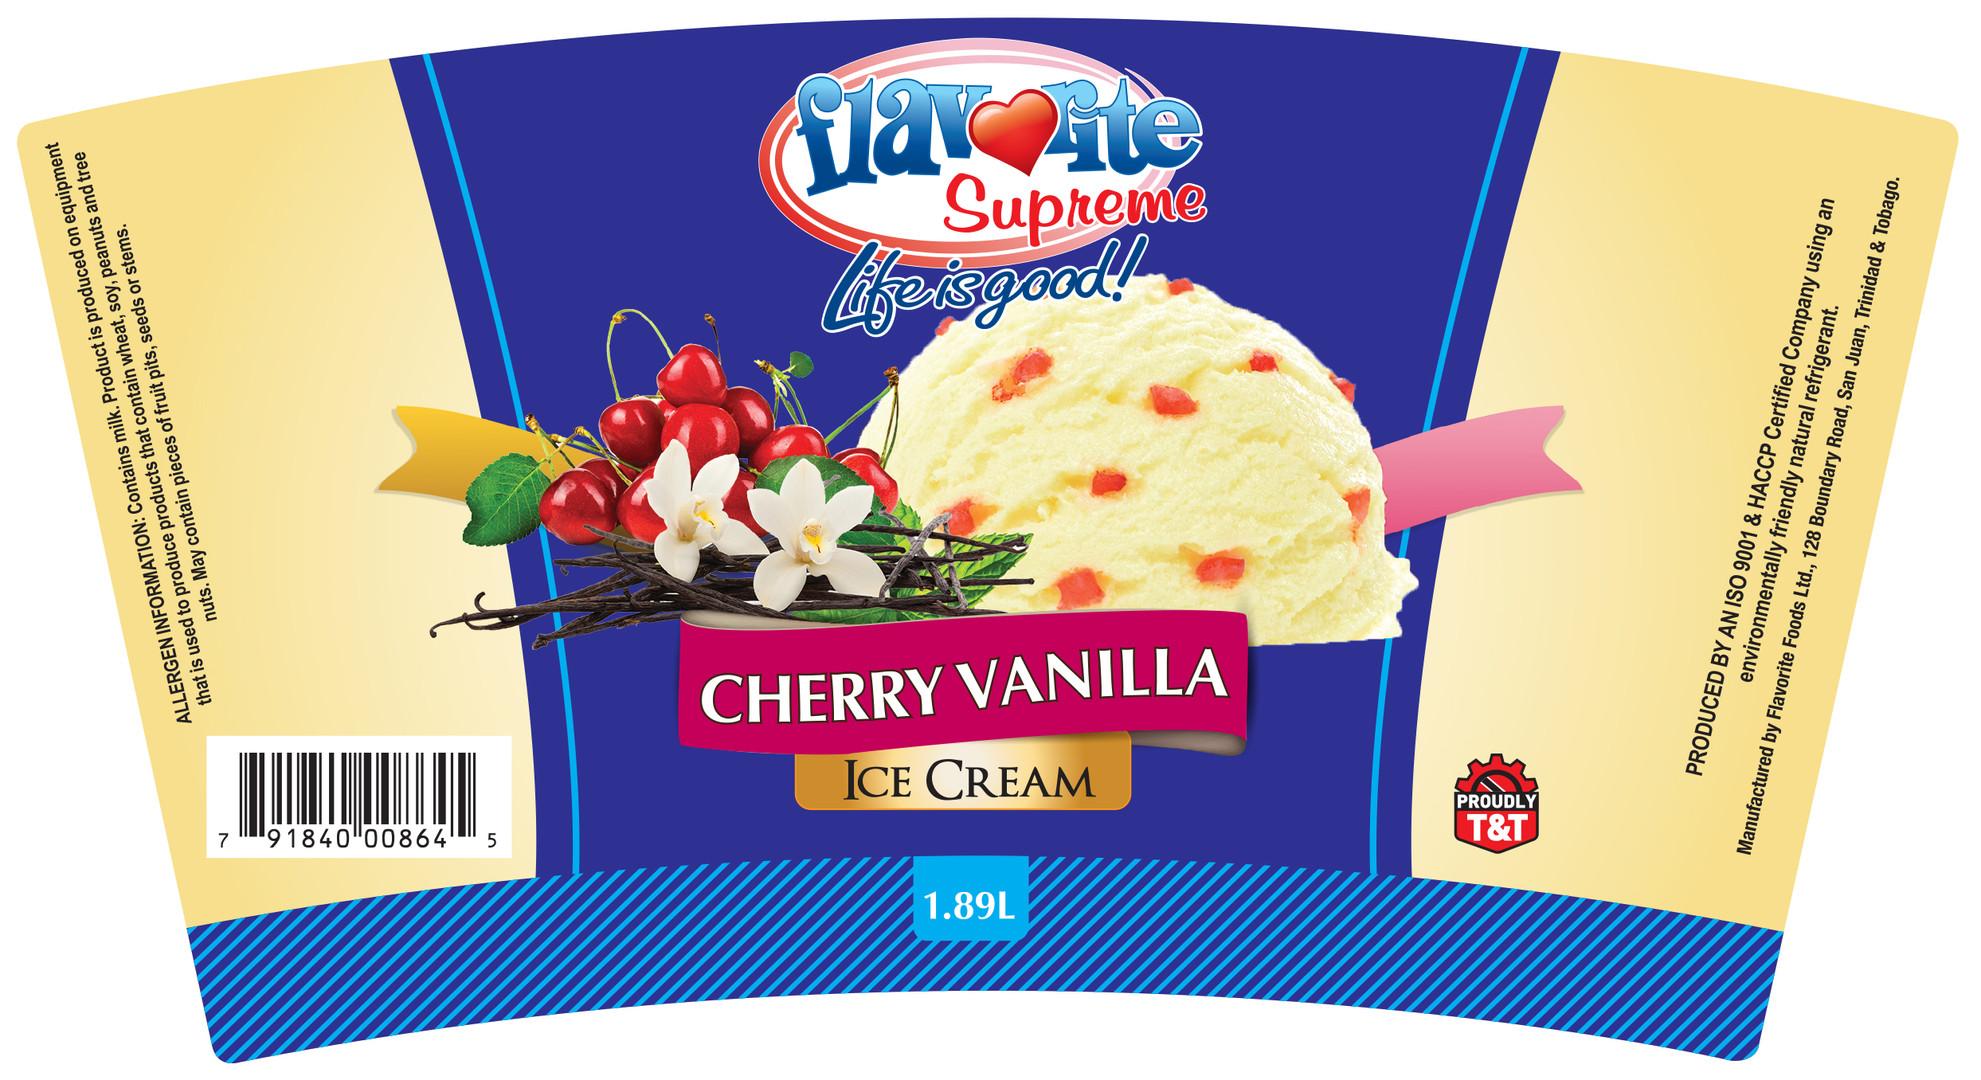 Flavorite Cherry Vanilla Ice Cream - Flexo Label